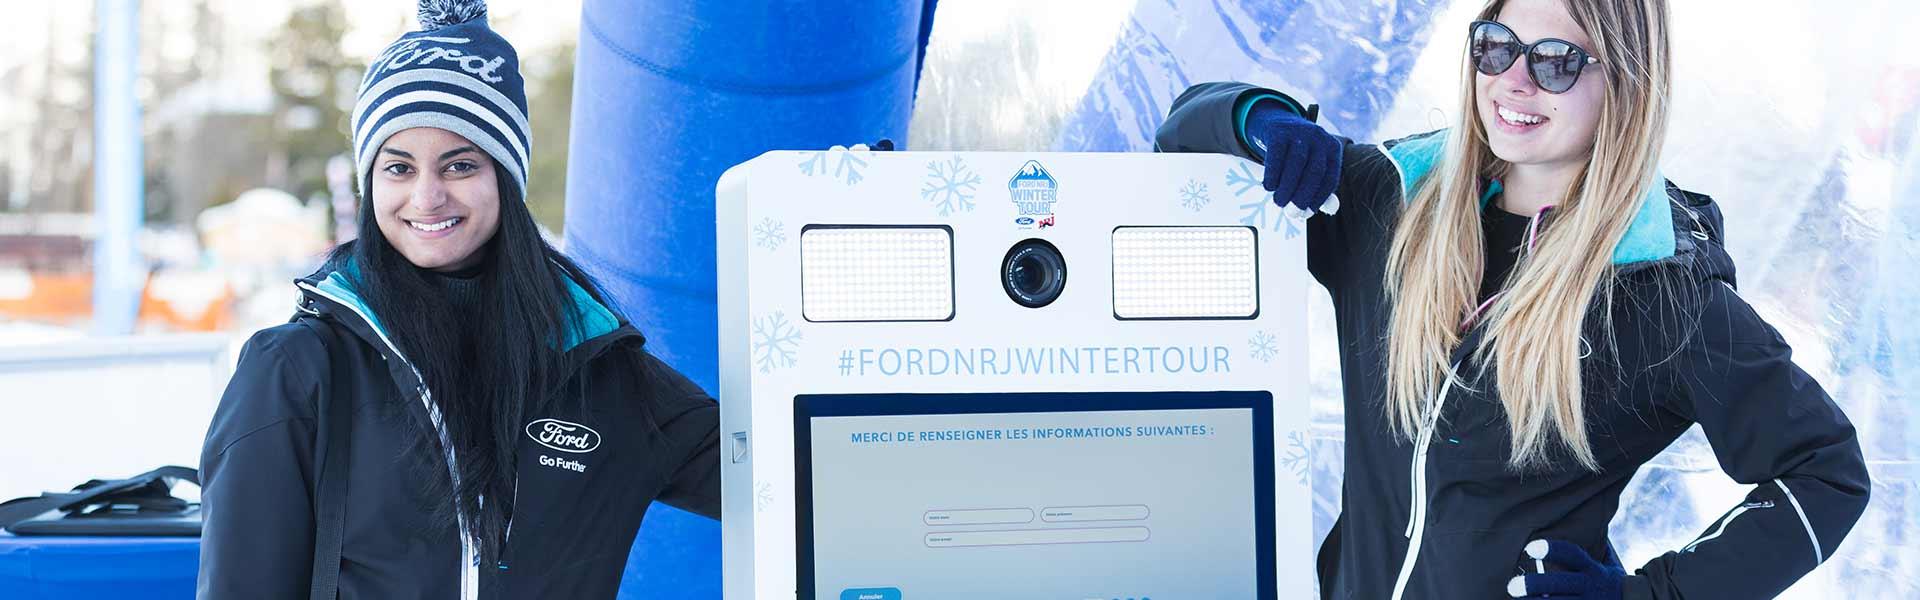 bfast-capture opération Ford NRJ Winter Tour